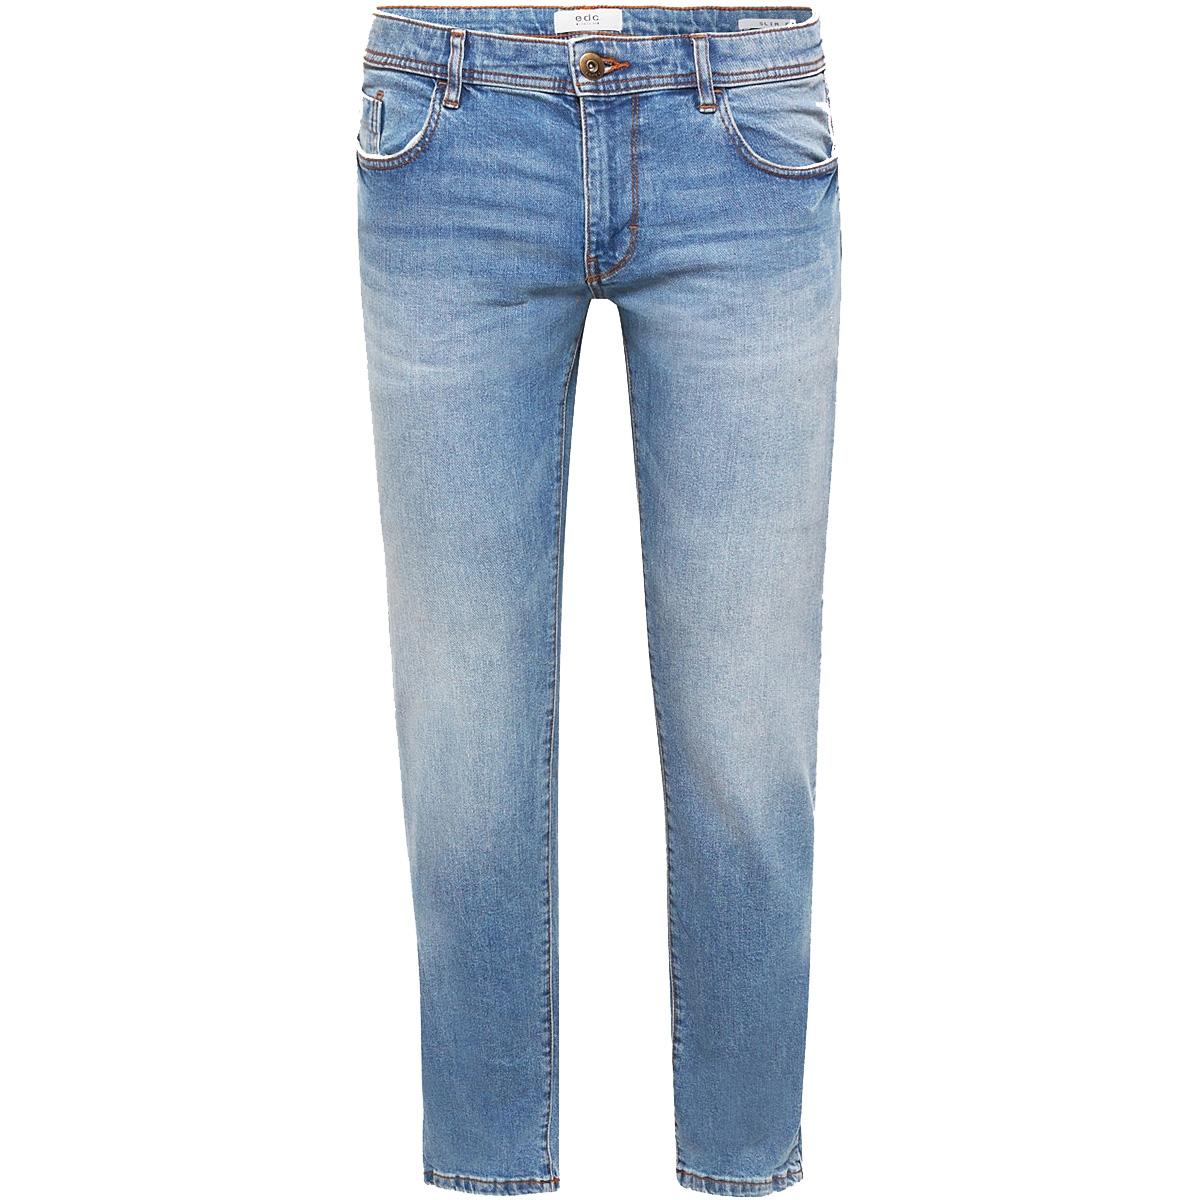 029cc2b004 edc jeans c902